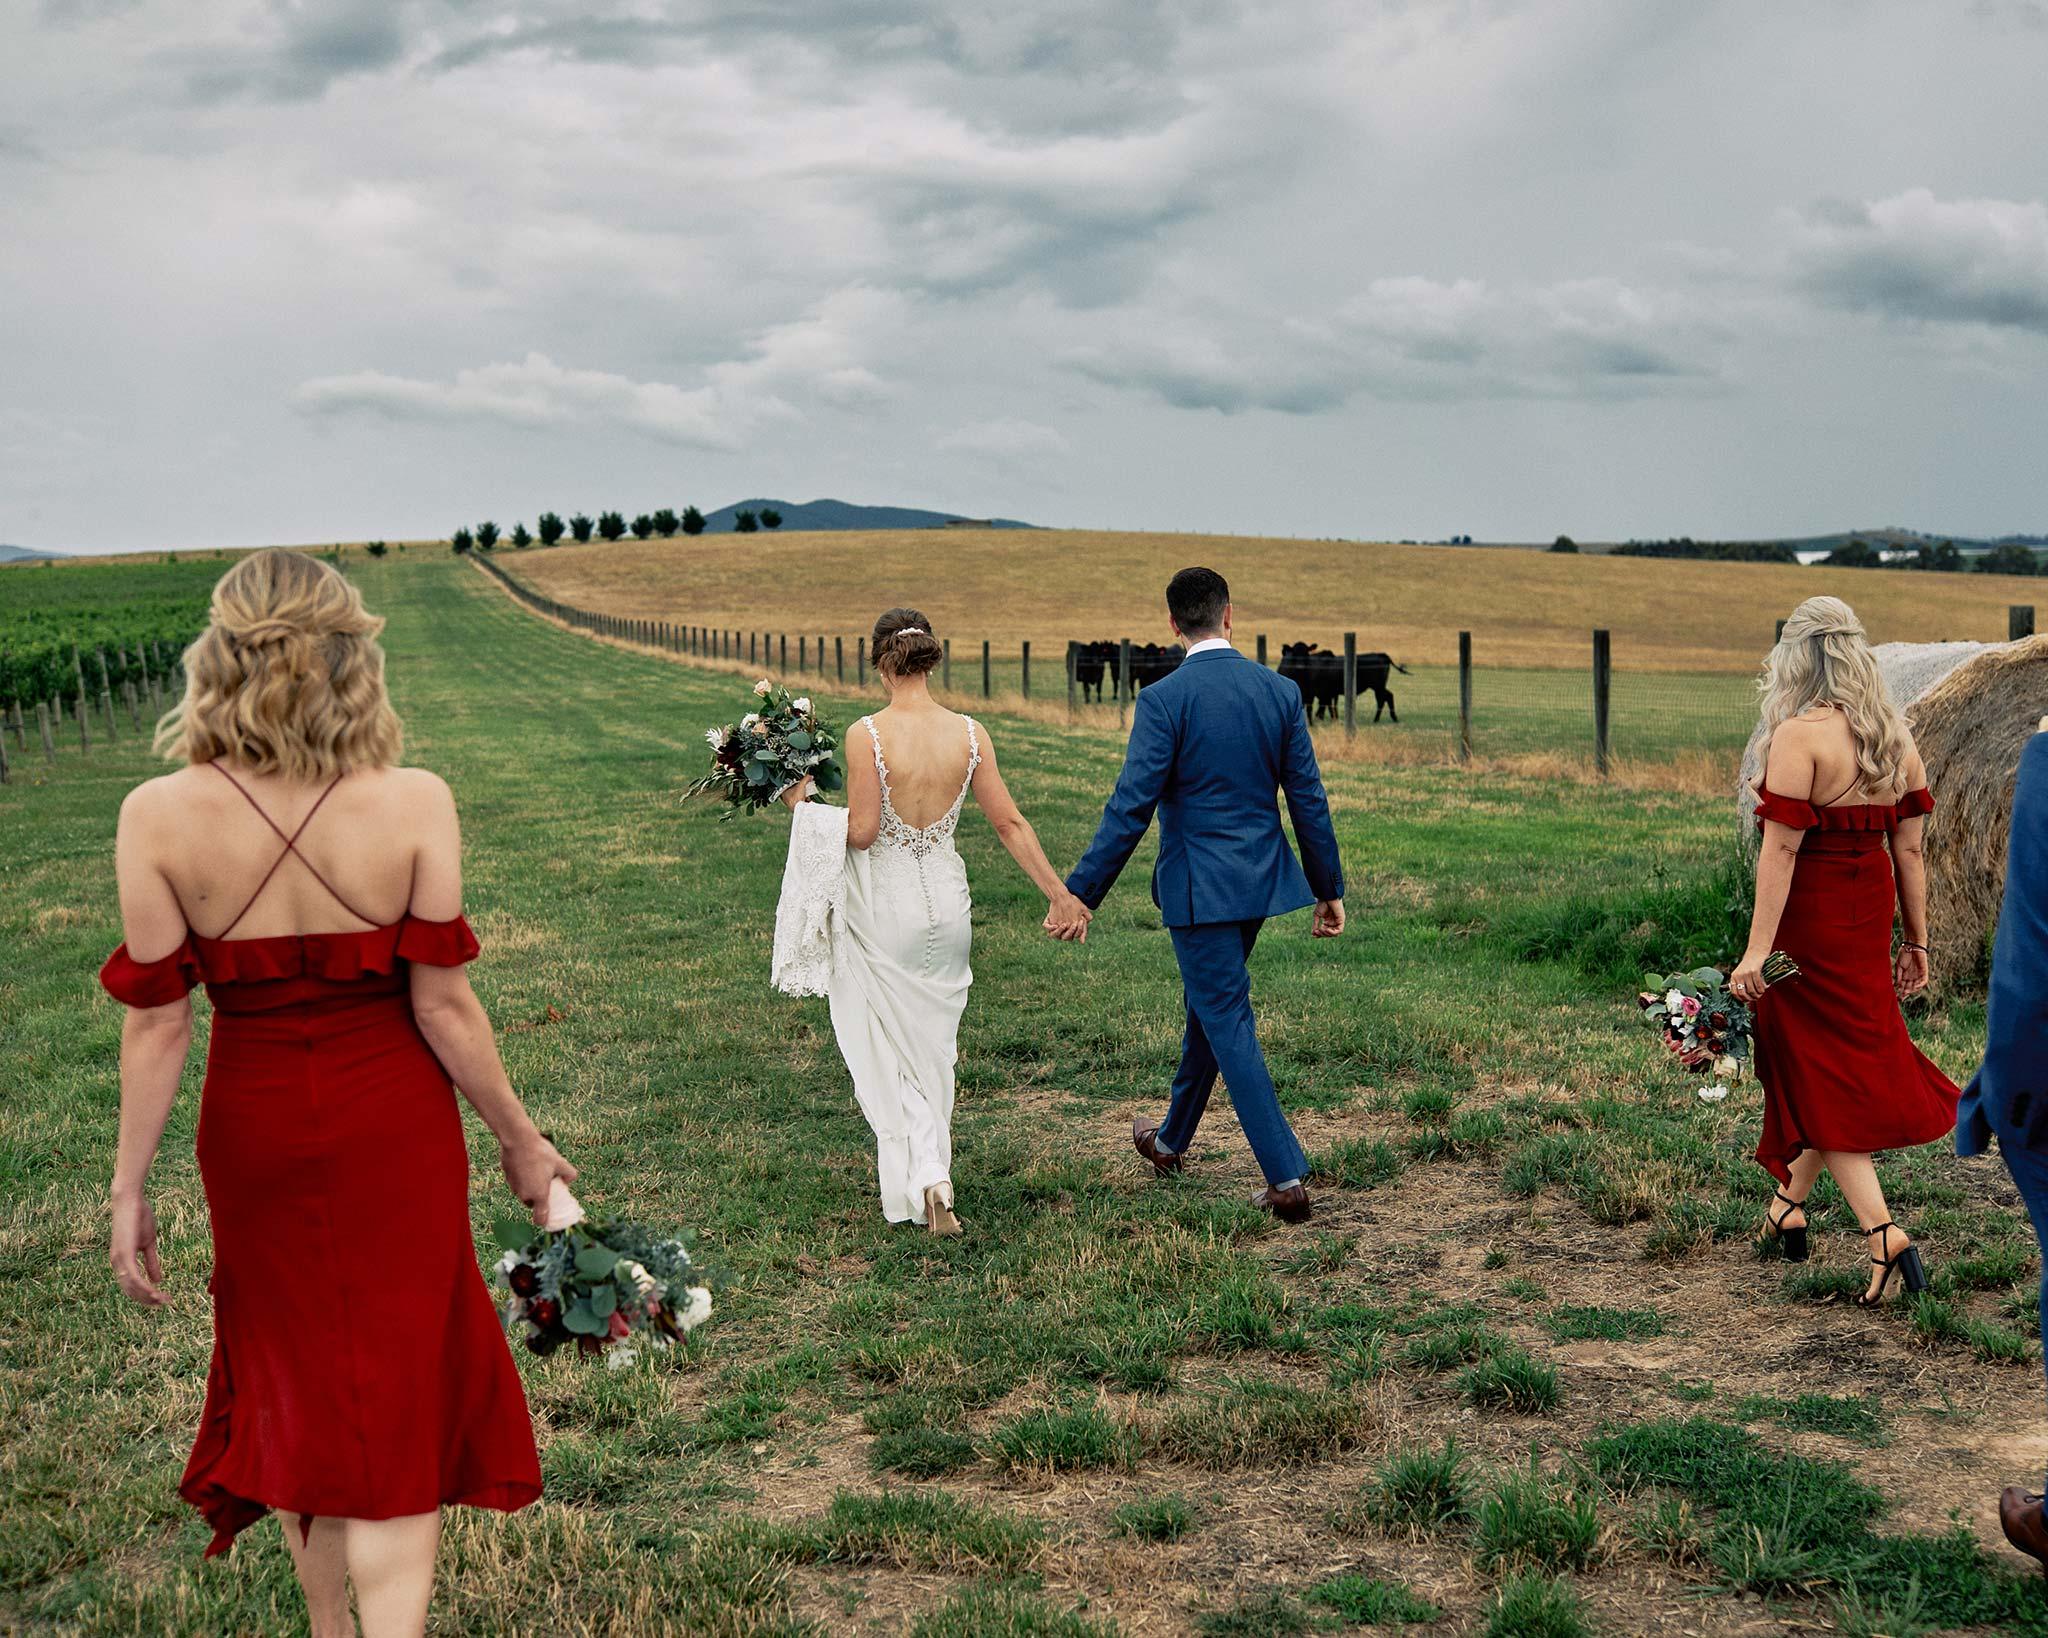 Zonzo estate wedding vineyard